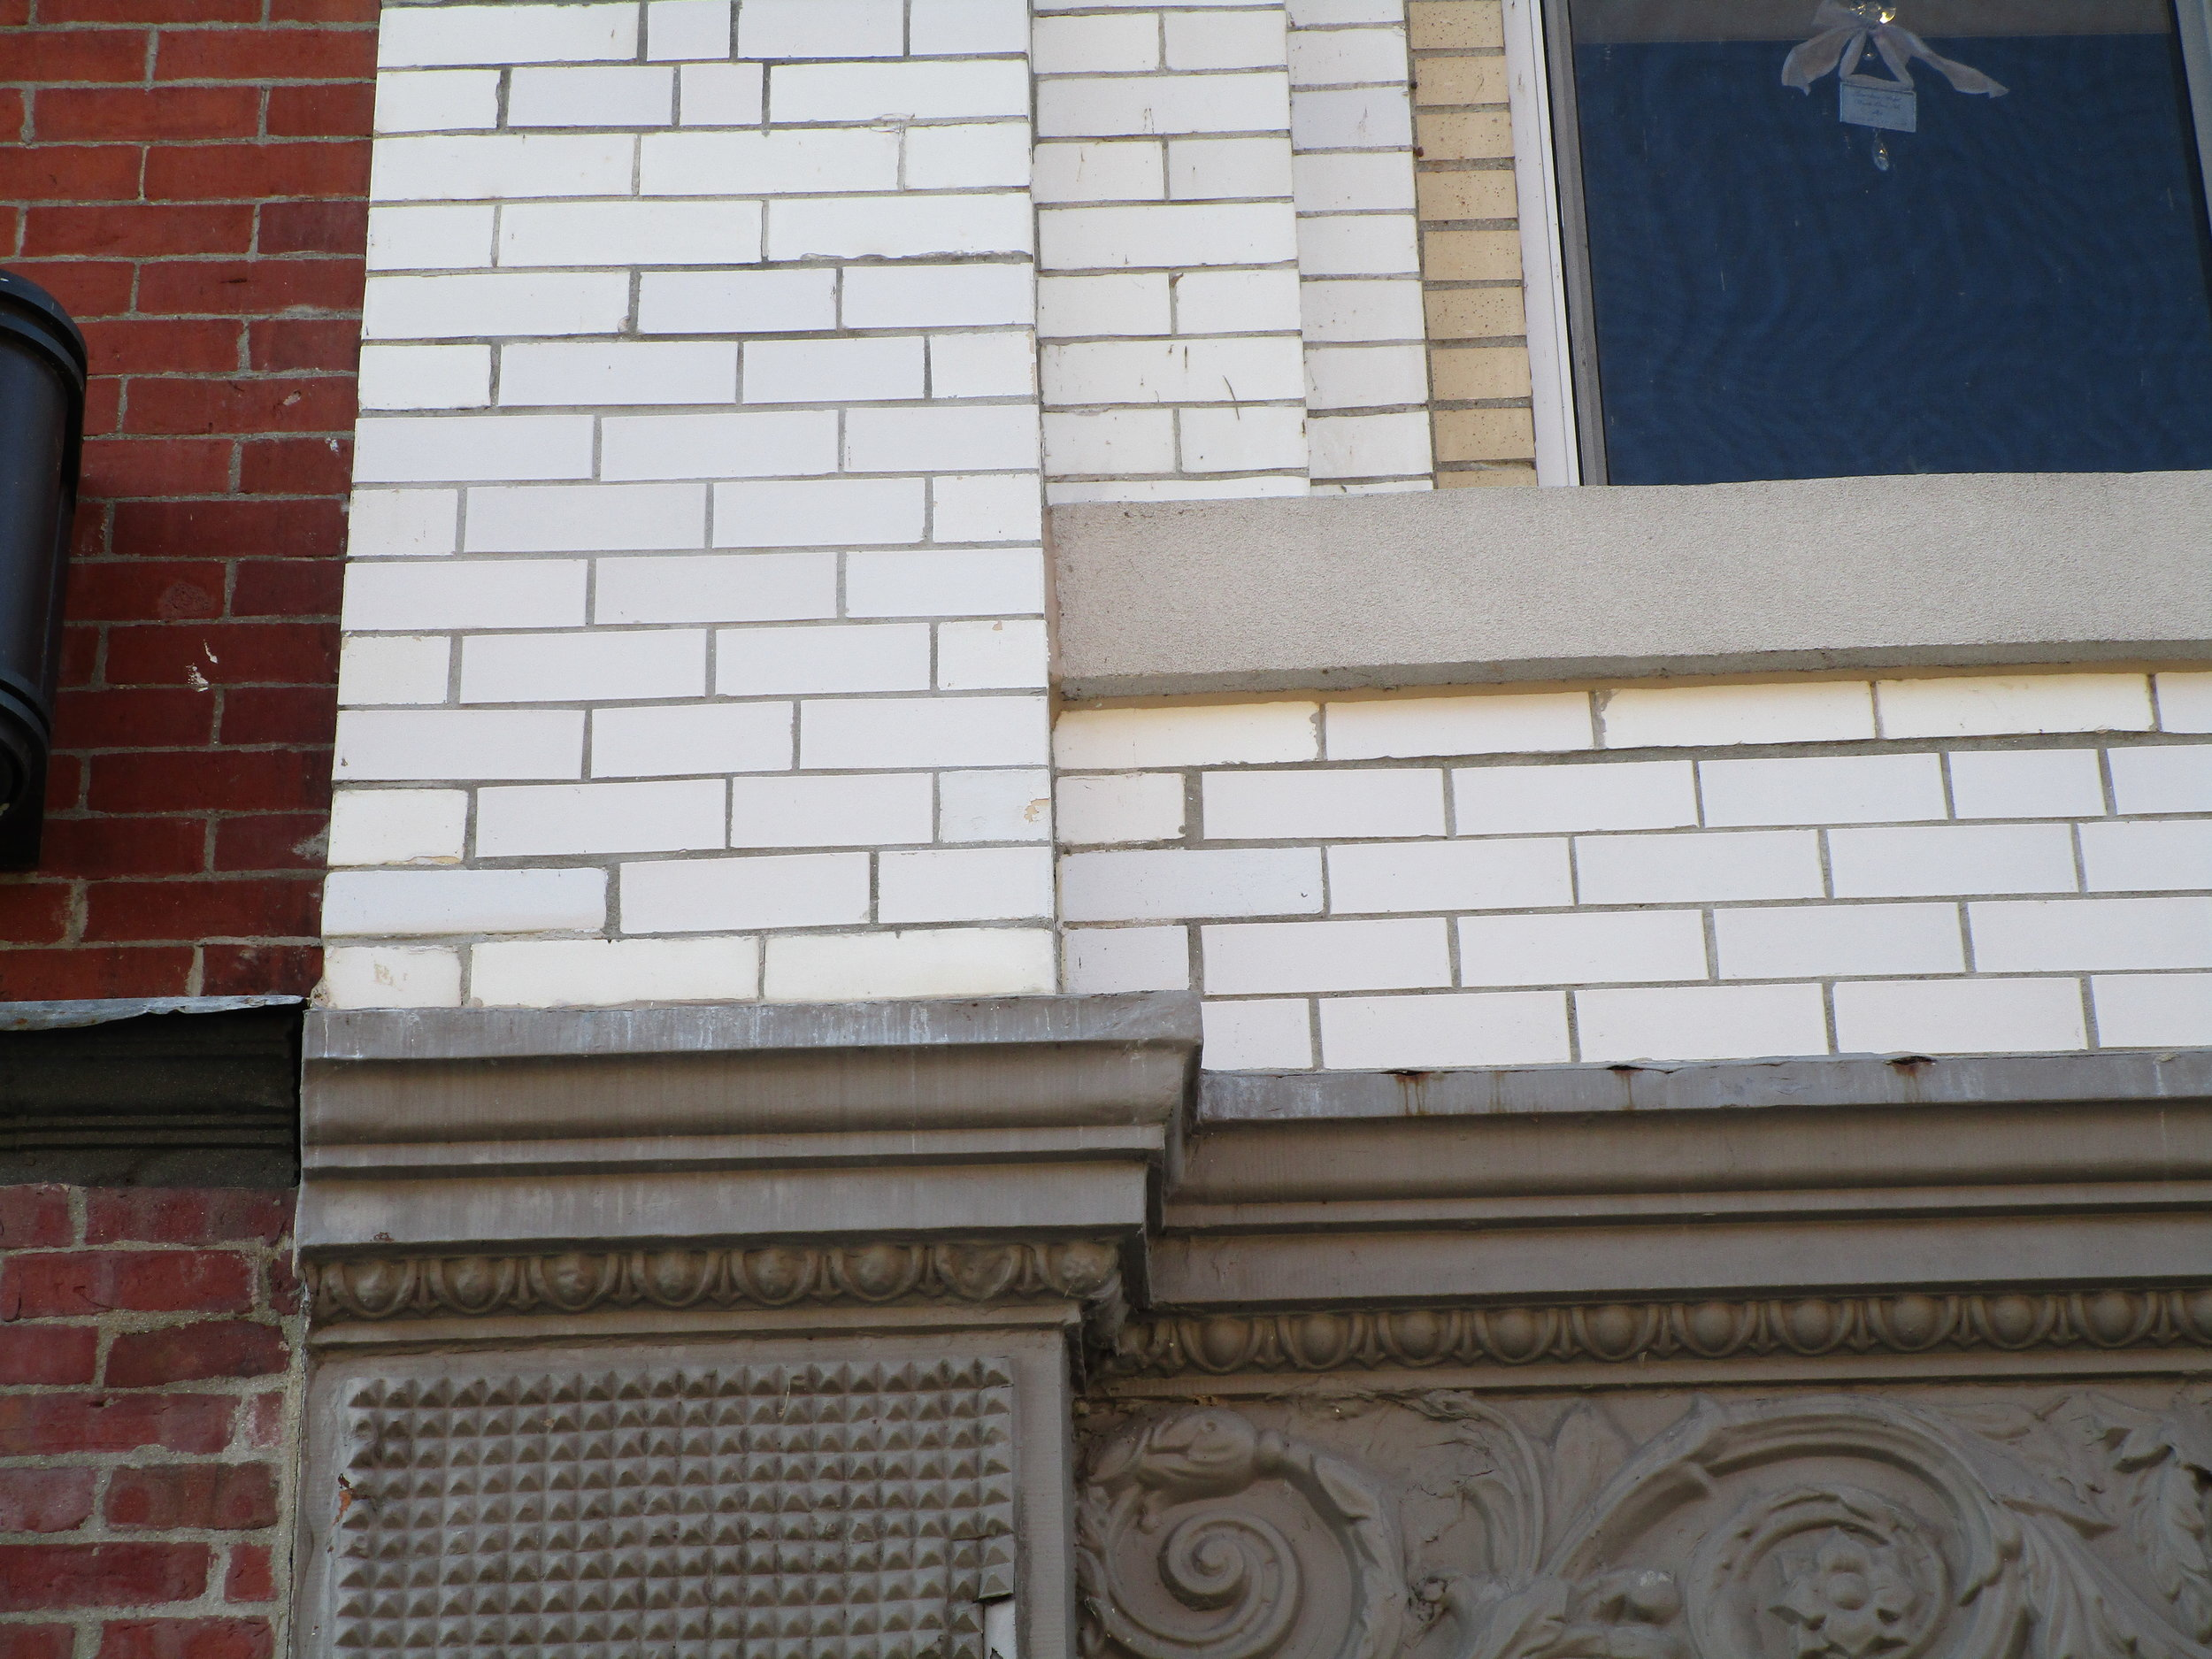 Osgood Building Masonry Detail_129 Lisbon Street_Lewiston_ME_Geoff Melhuish_12_4_2017.JPG